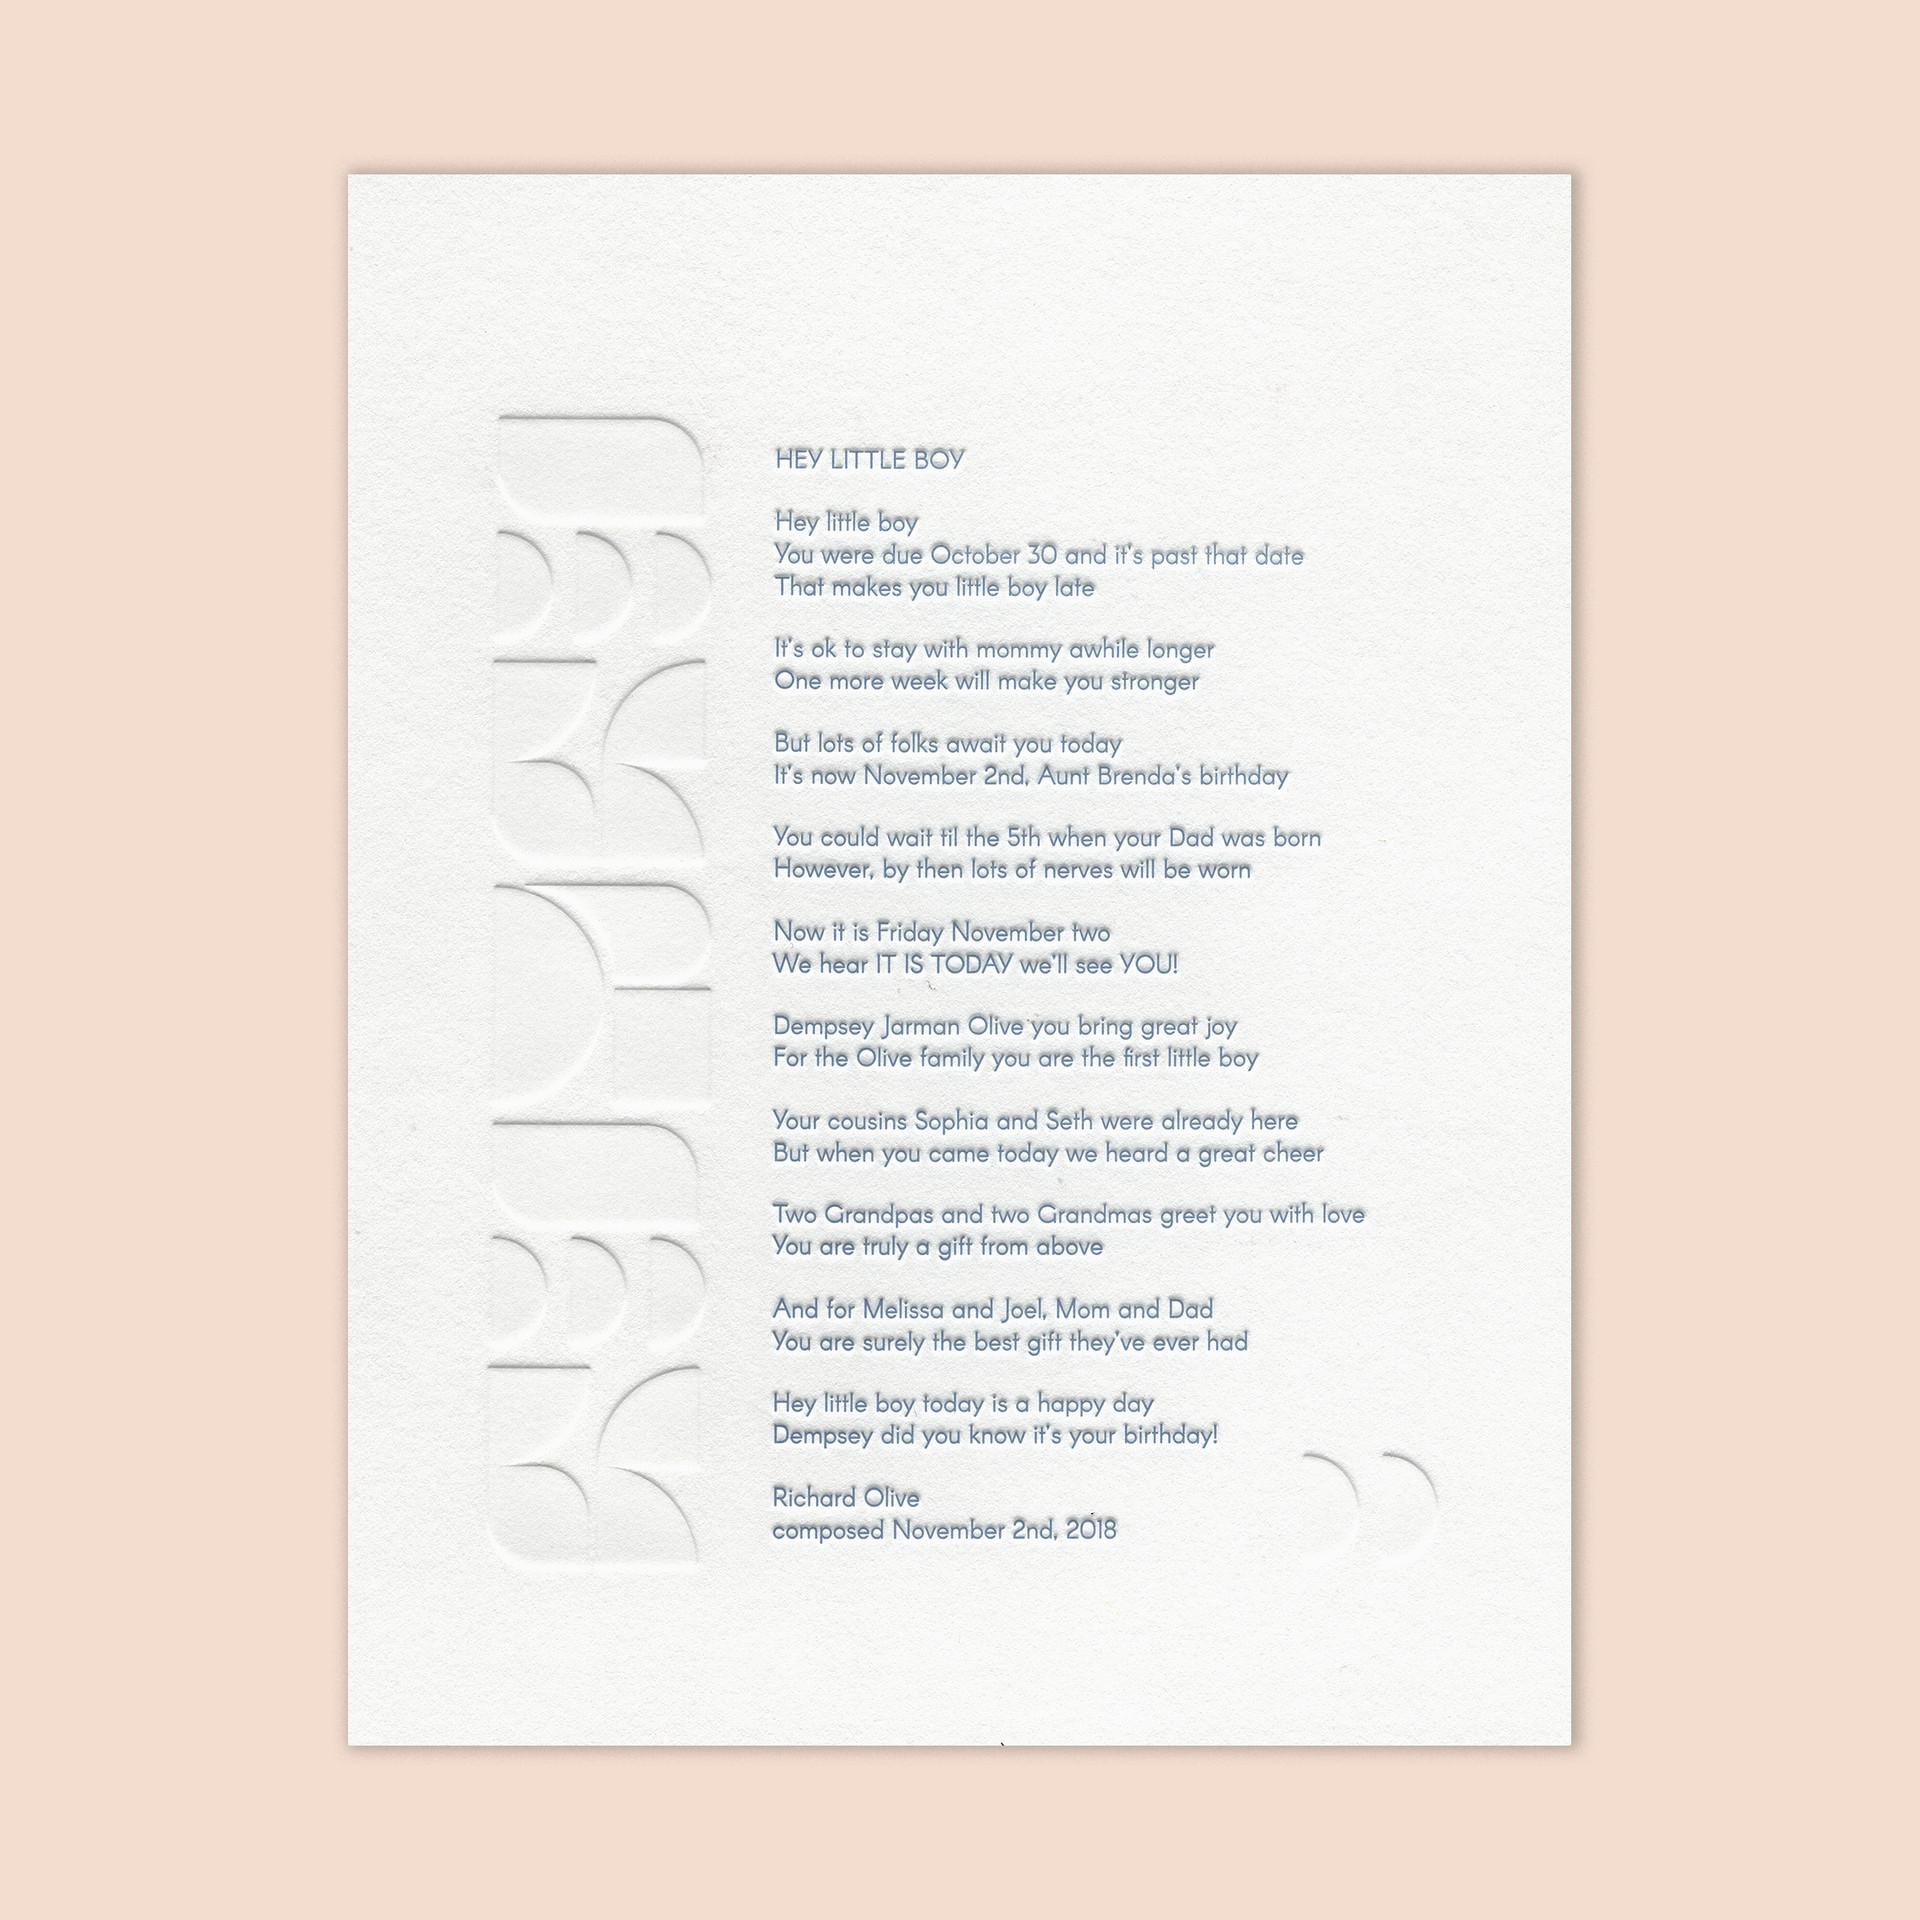 Dempsey poem-Full final.jpg